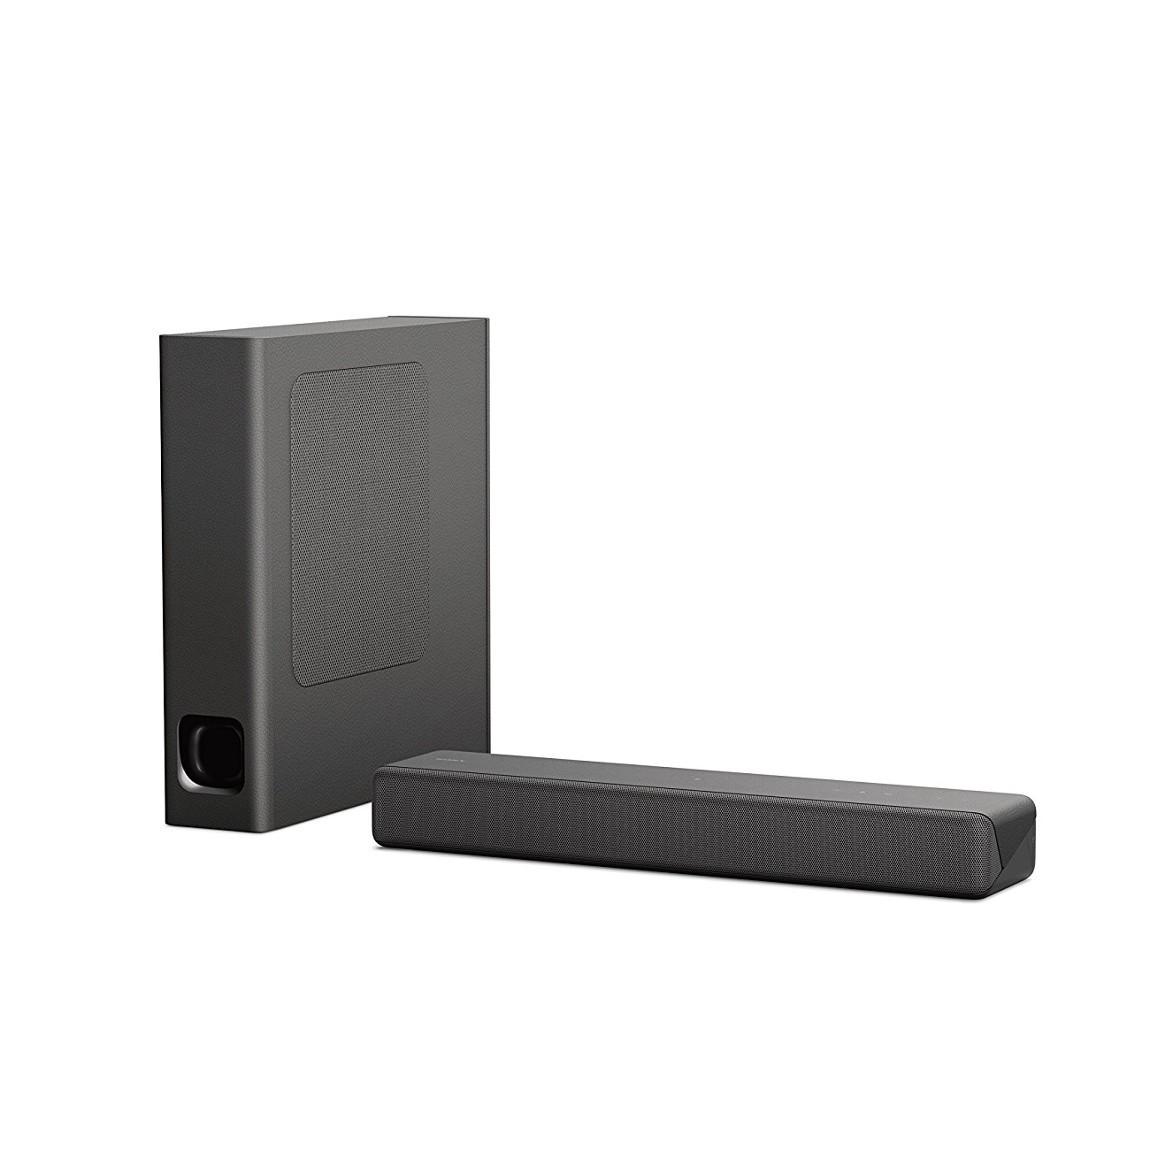 Sony HT-MT500 - Soundbar mit WLAN/Bluetooth - A...